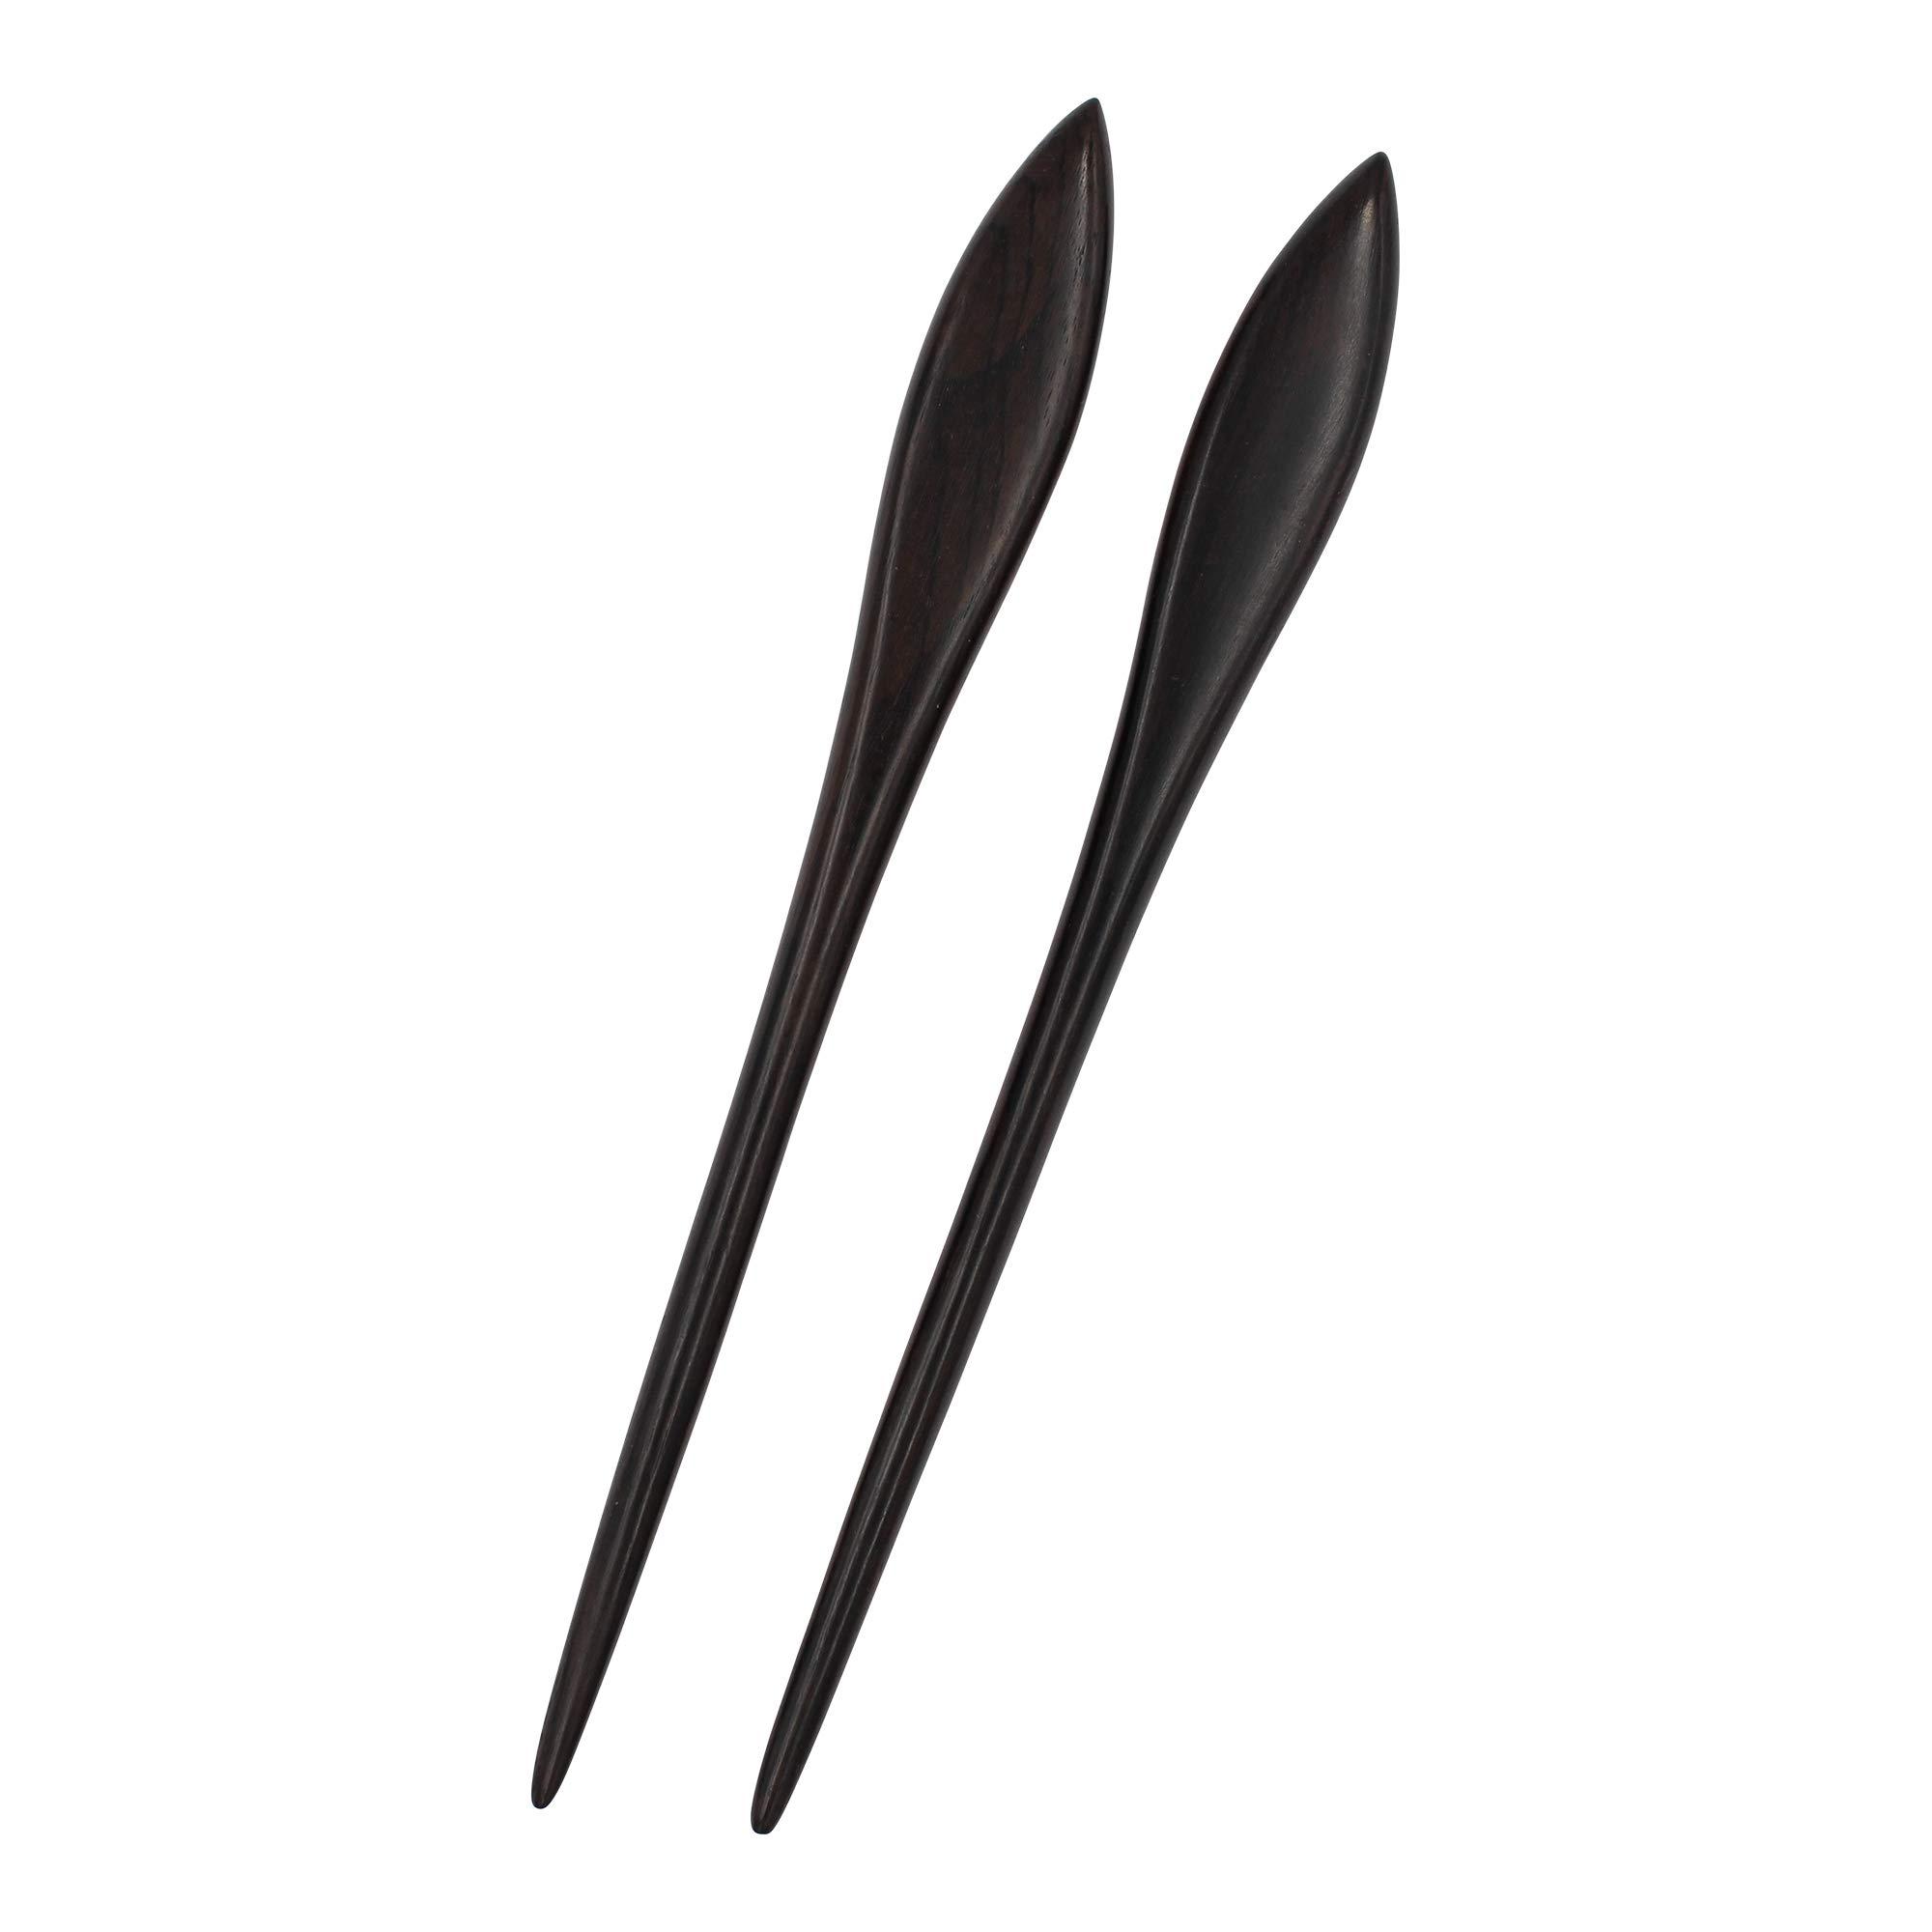 REAL SIC - Natural Sandalwood Hair Sticks for Women - Set of 2 - Sustainable Retro Boho Fashion Chopsticks/Wood Hair Pins for Long Hair (Paddle)